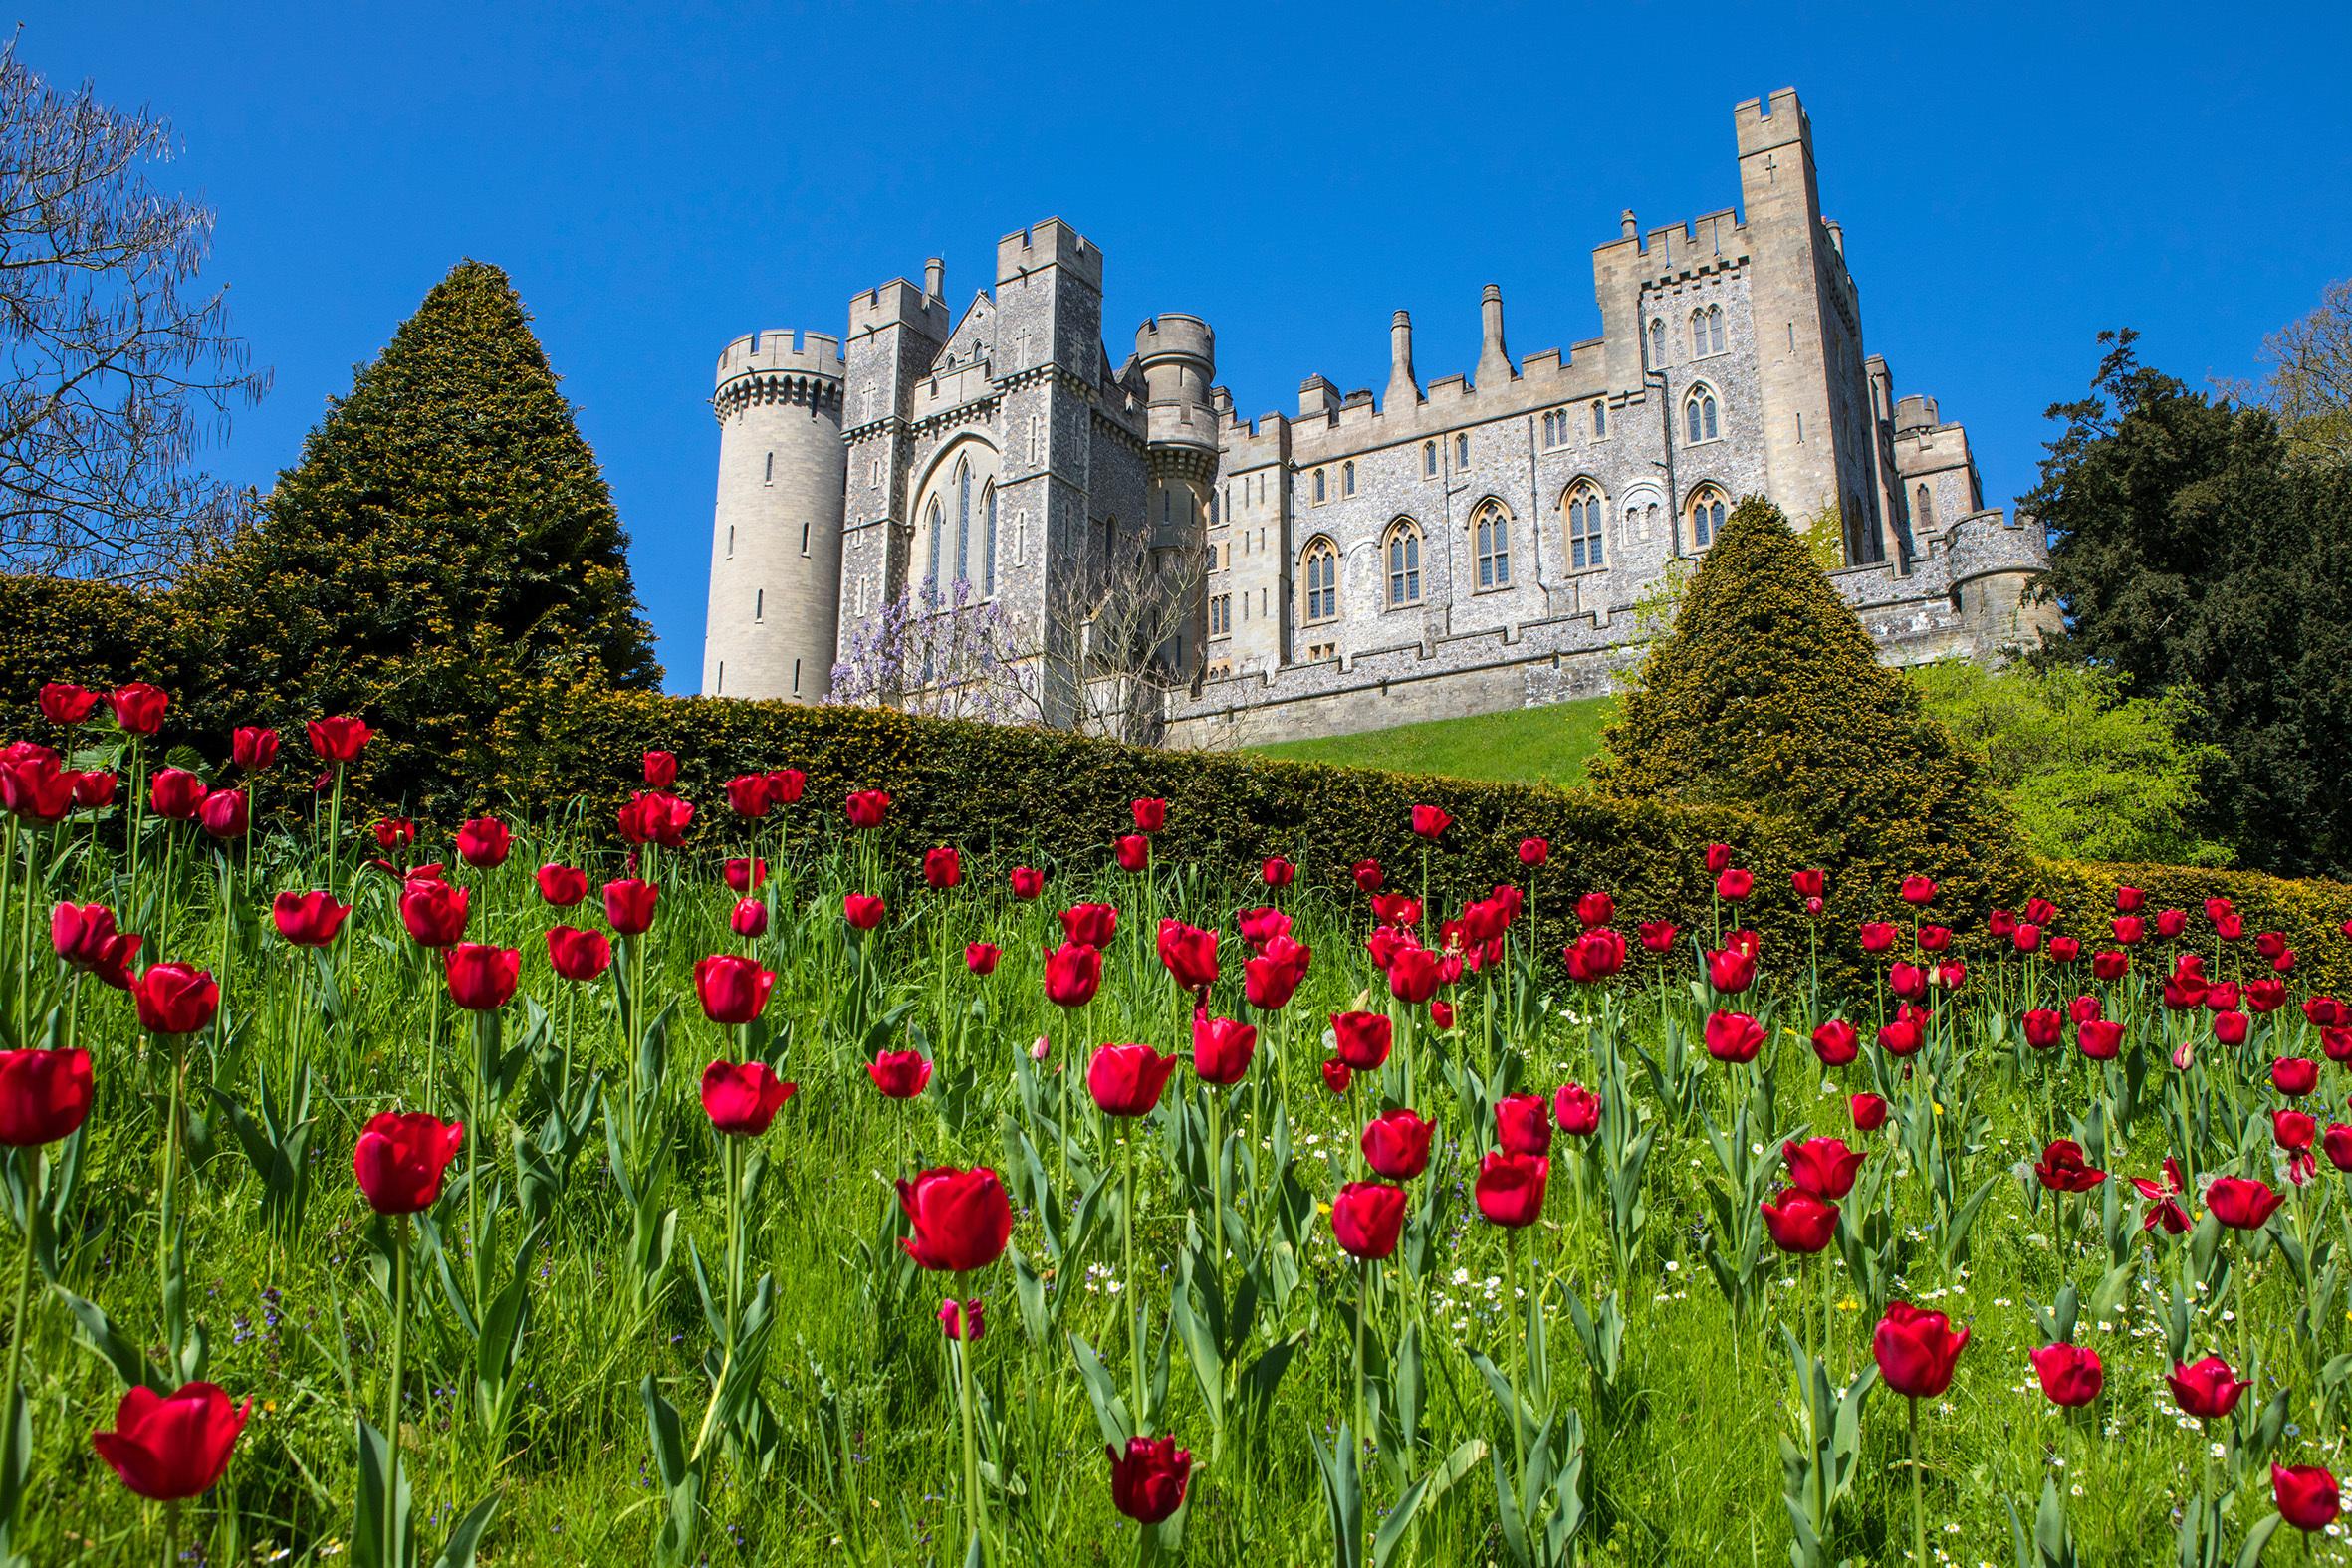 Tulips at Arundel Castle